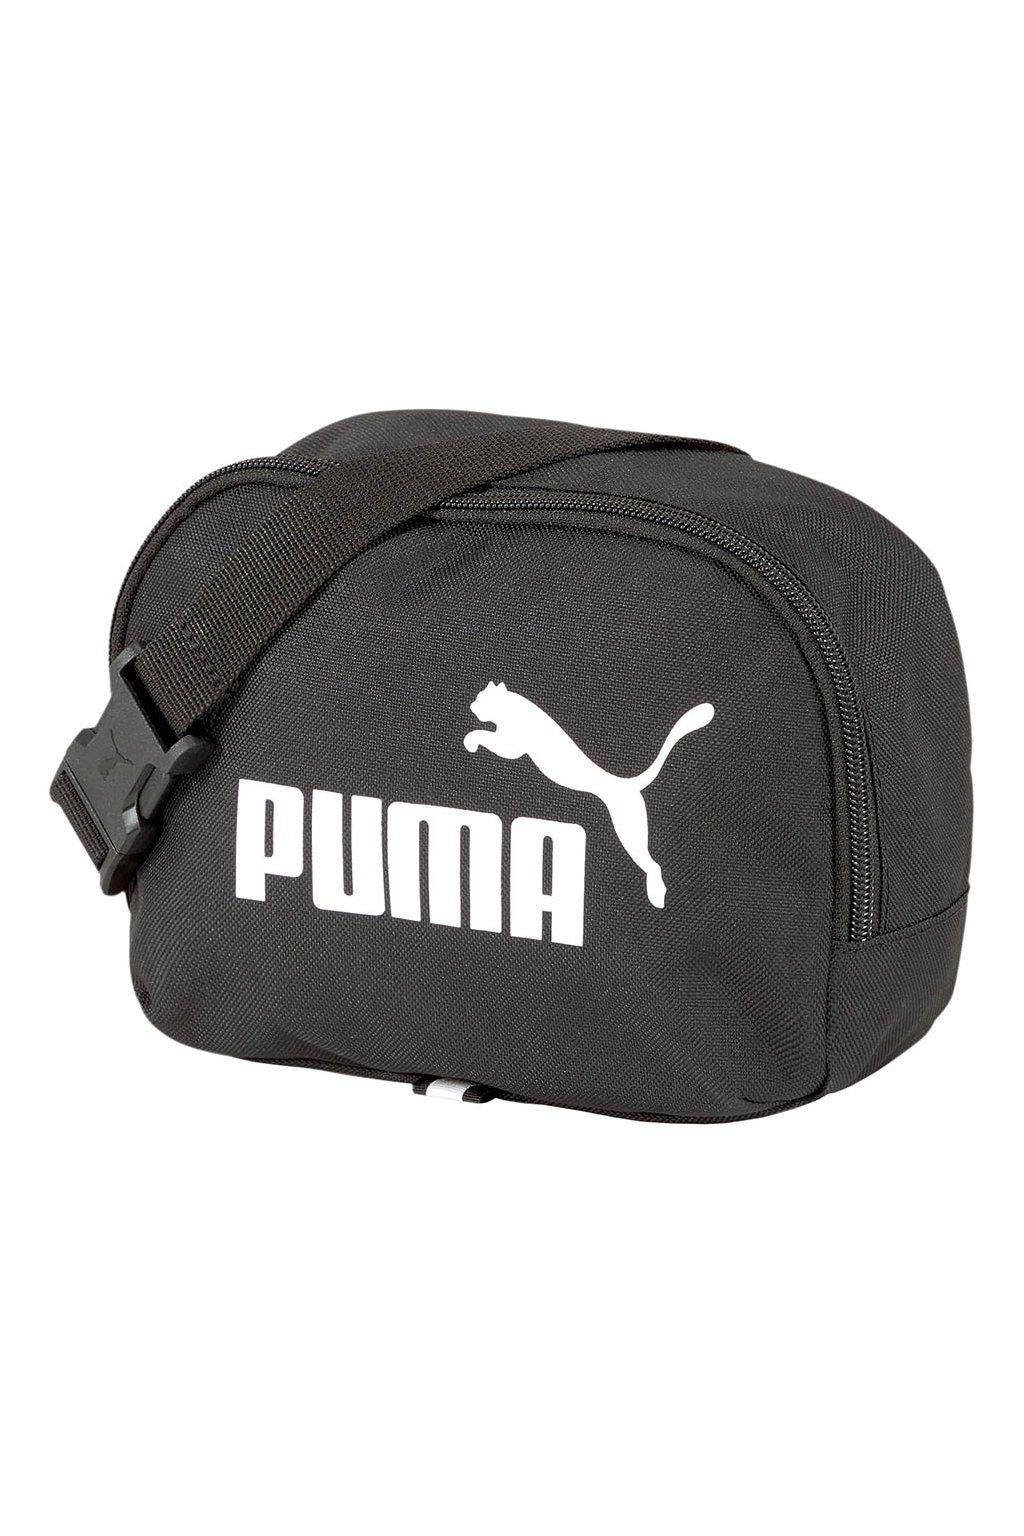 Ľadvinka Puma Phase Waist Bag čierna 076908 01